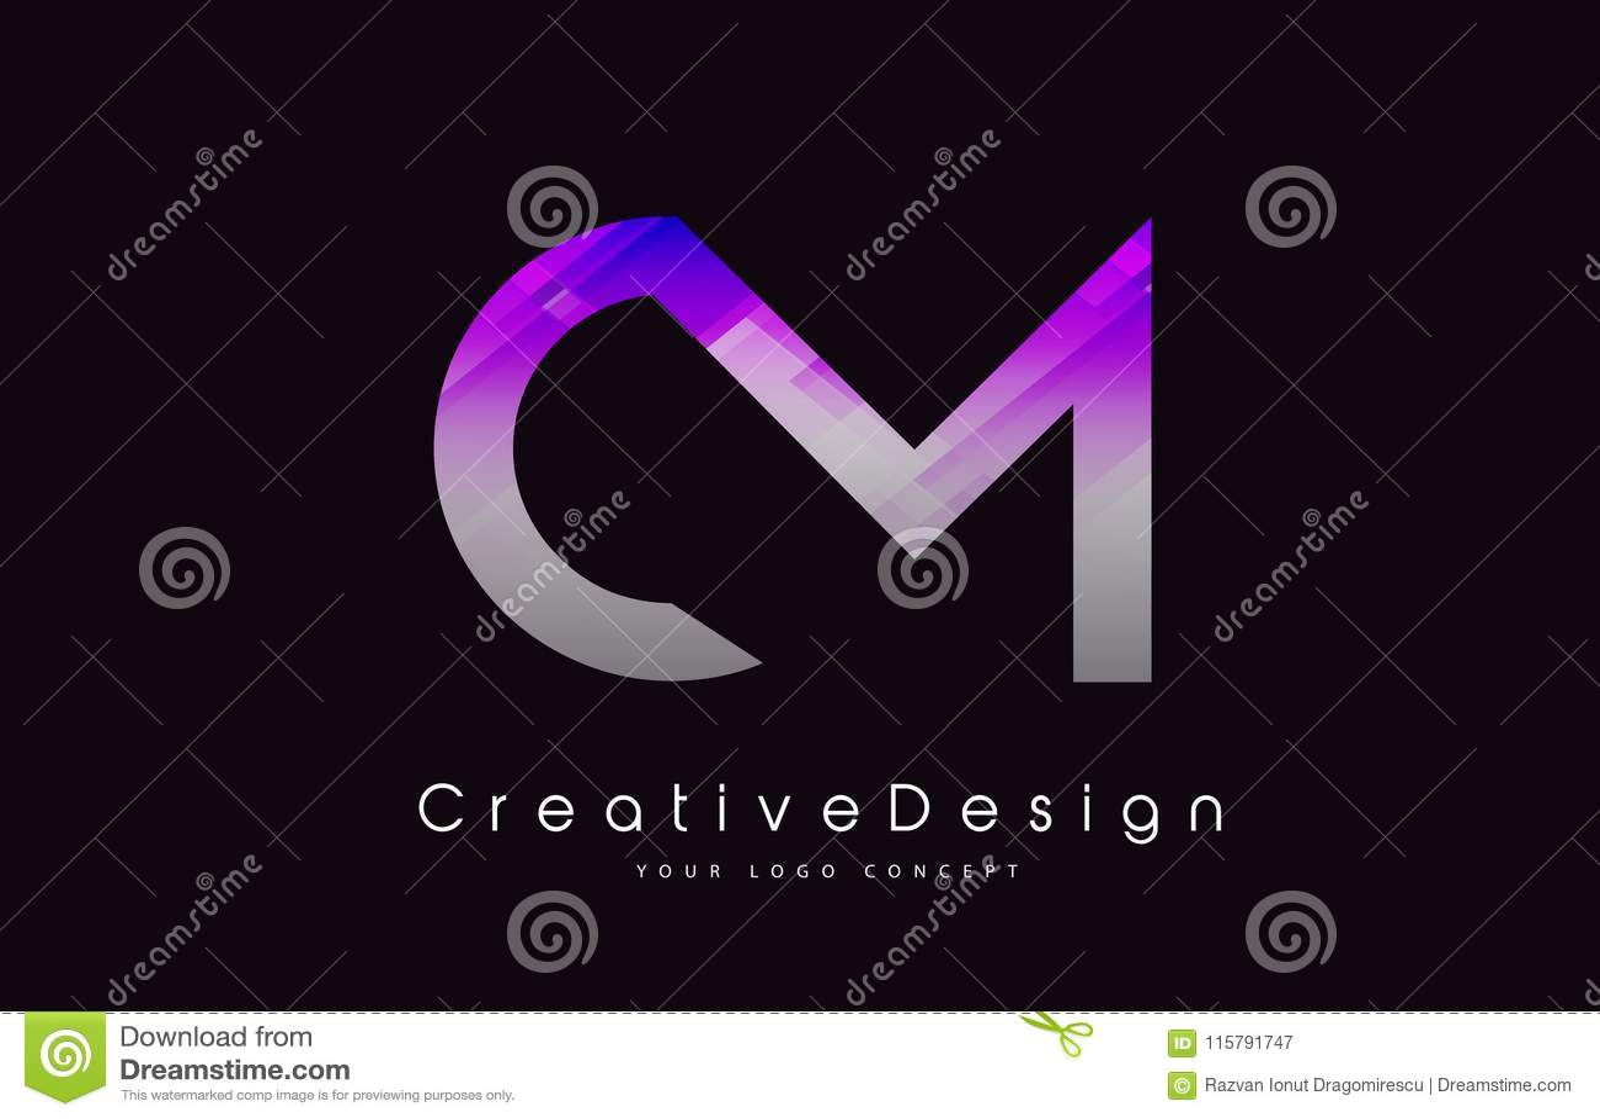 Cm-Brief Logo Design Purper Textuur Creatief Pictogram Moderne Lette